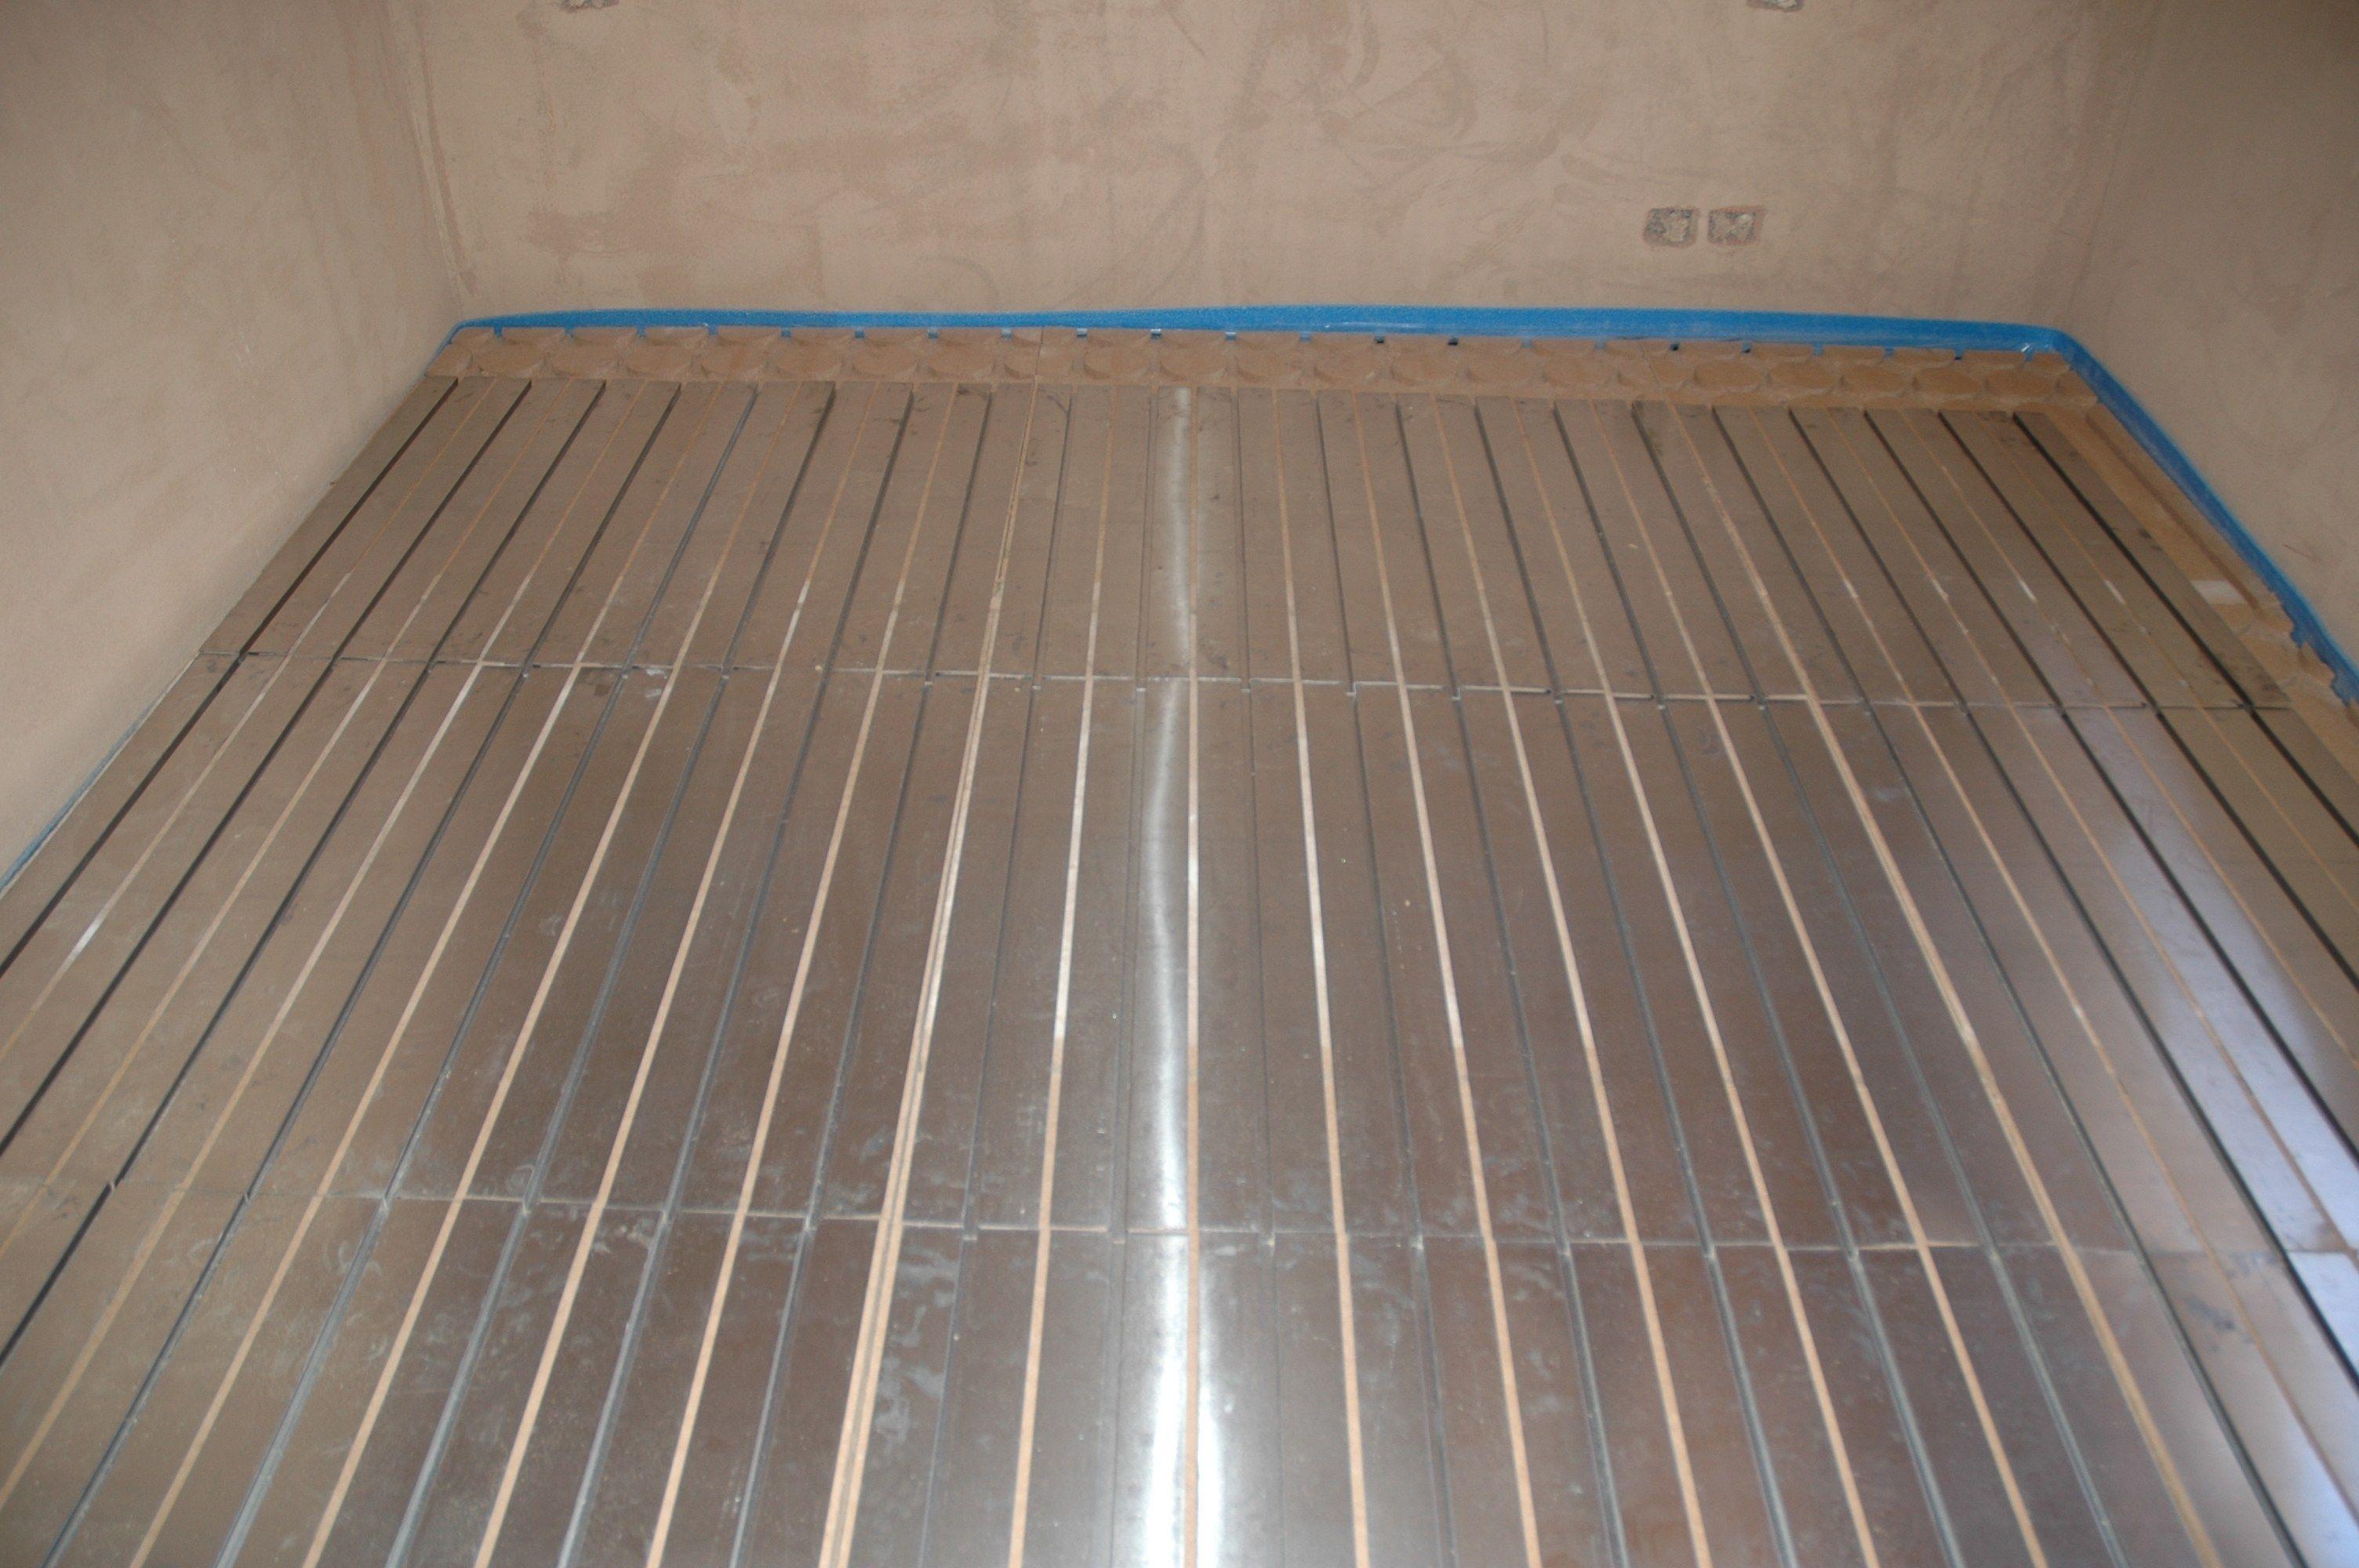 Wood fibre radiant floor panel klimapan by nordtex for Wood floor panels